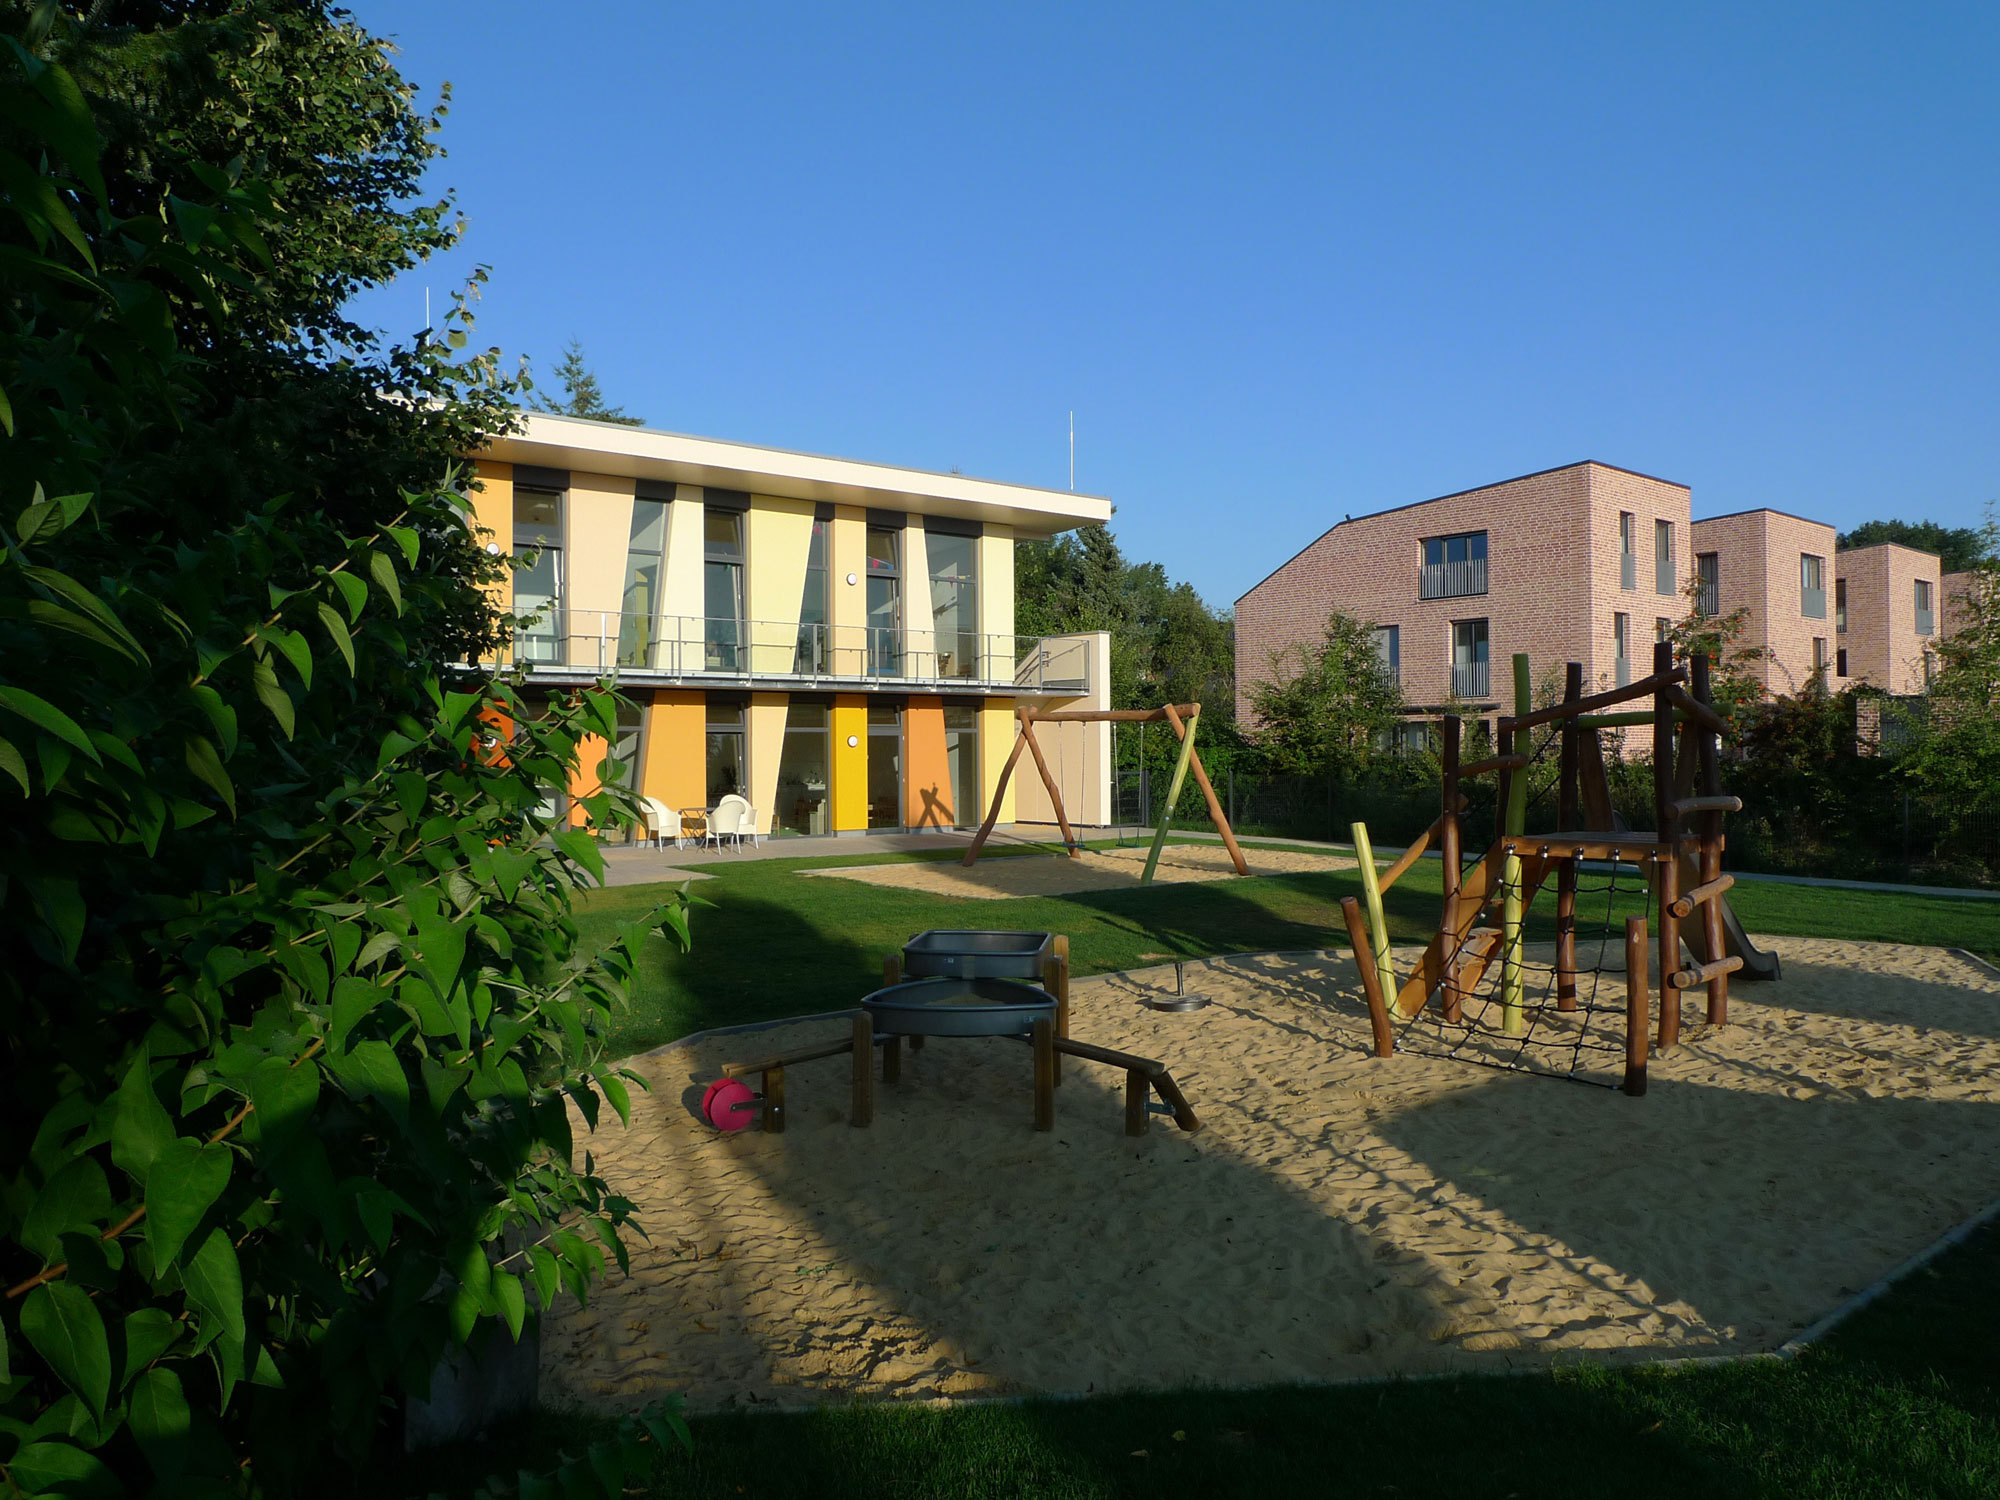 Architekten Coesfeld bock neuhaus partner coesfeld architekten baunetz architekten